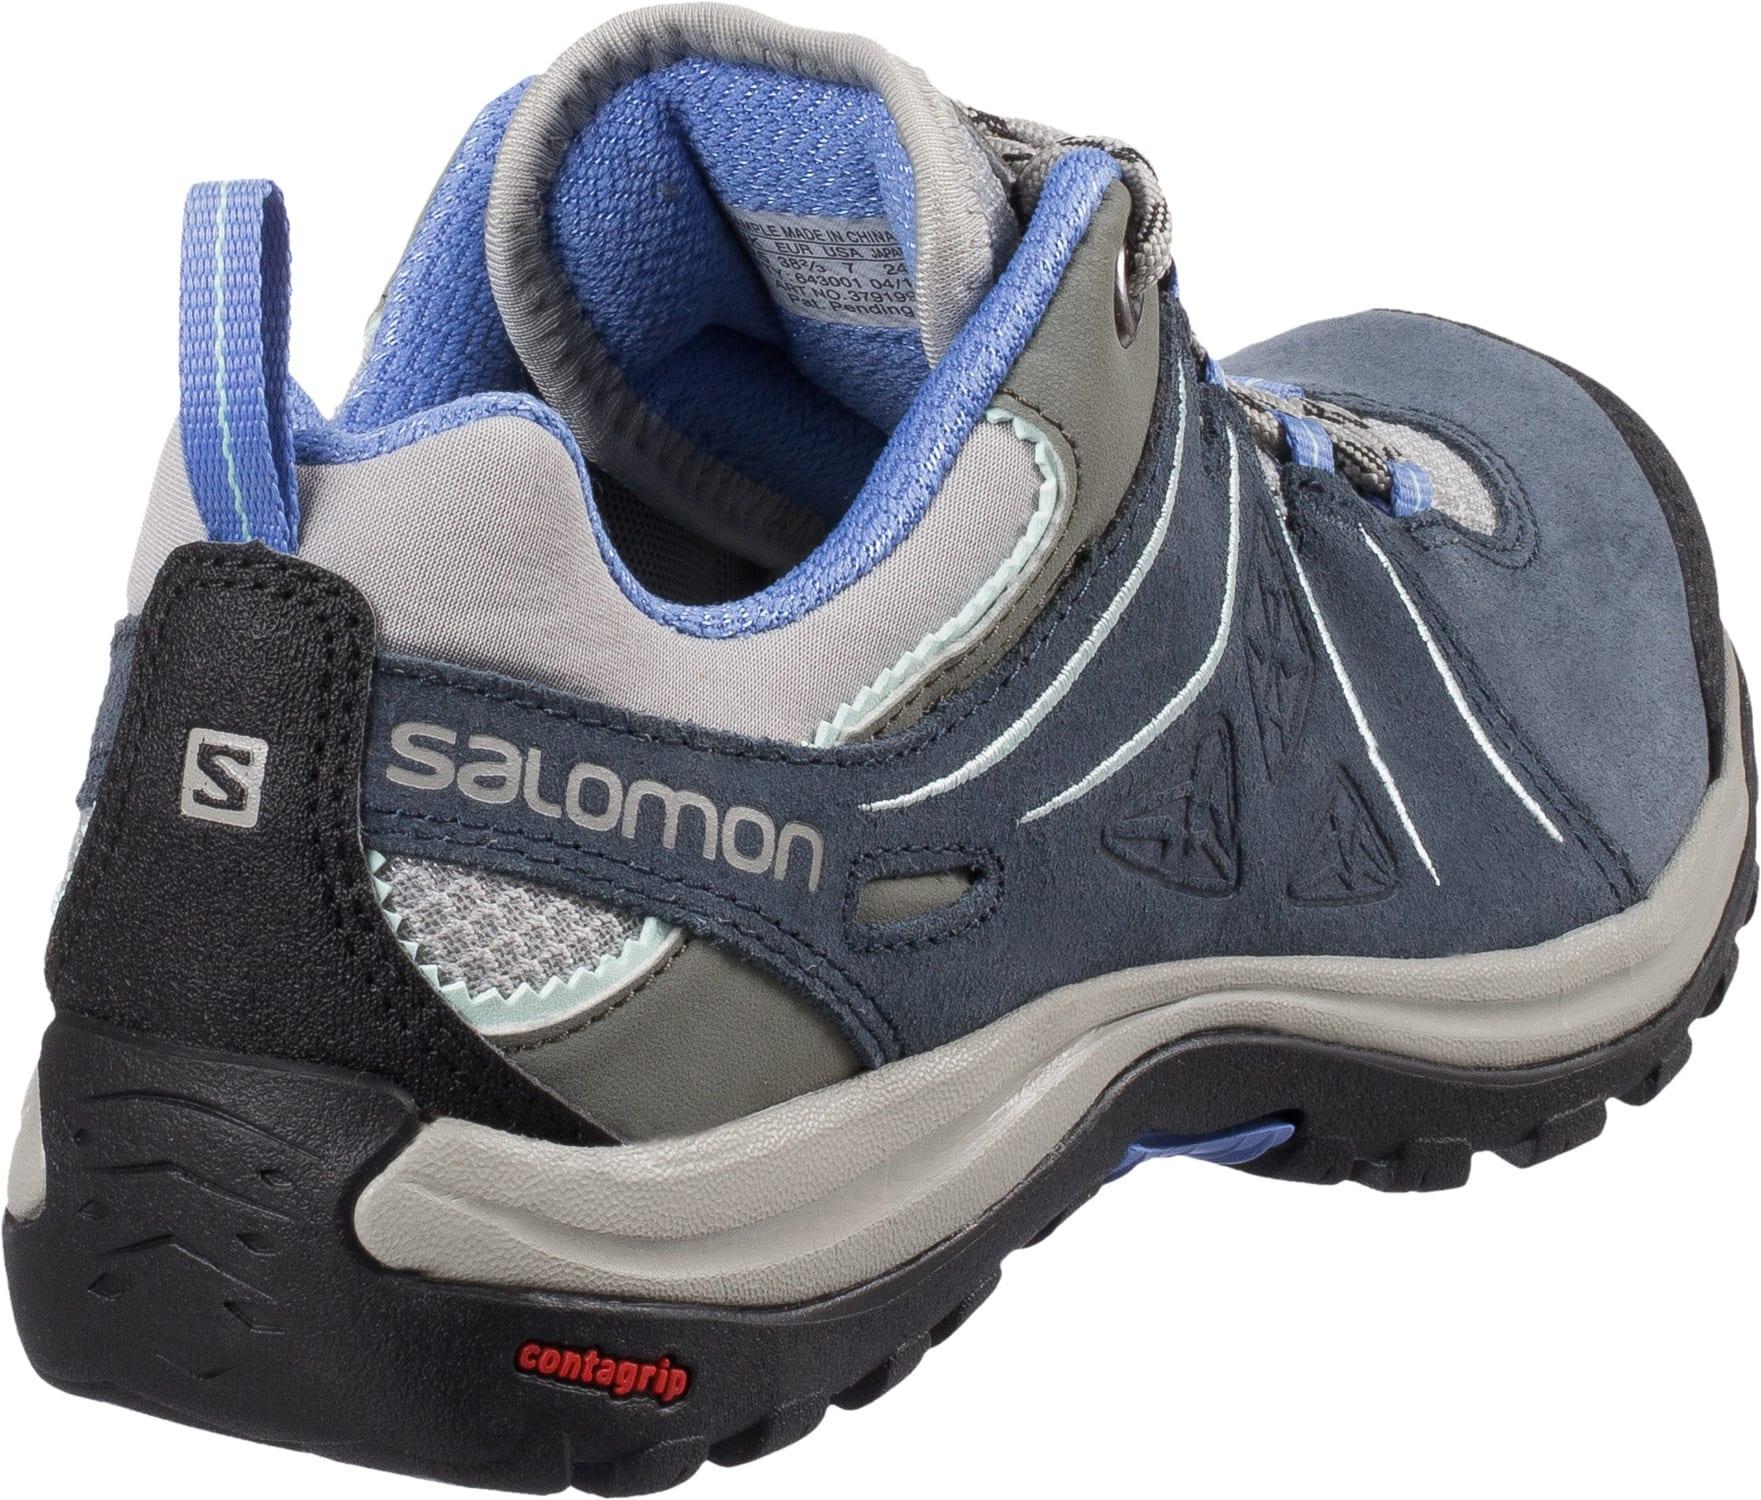 SALOMON ELLIPSE 2 LTR Womens Trekking Hiking Leather Shoes